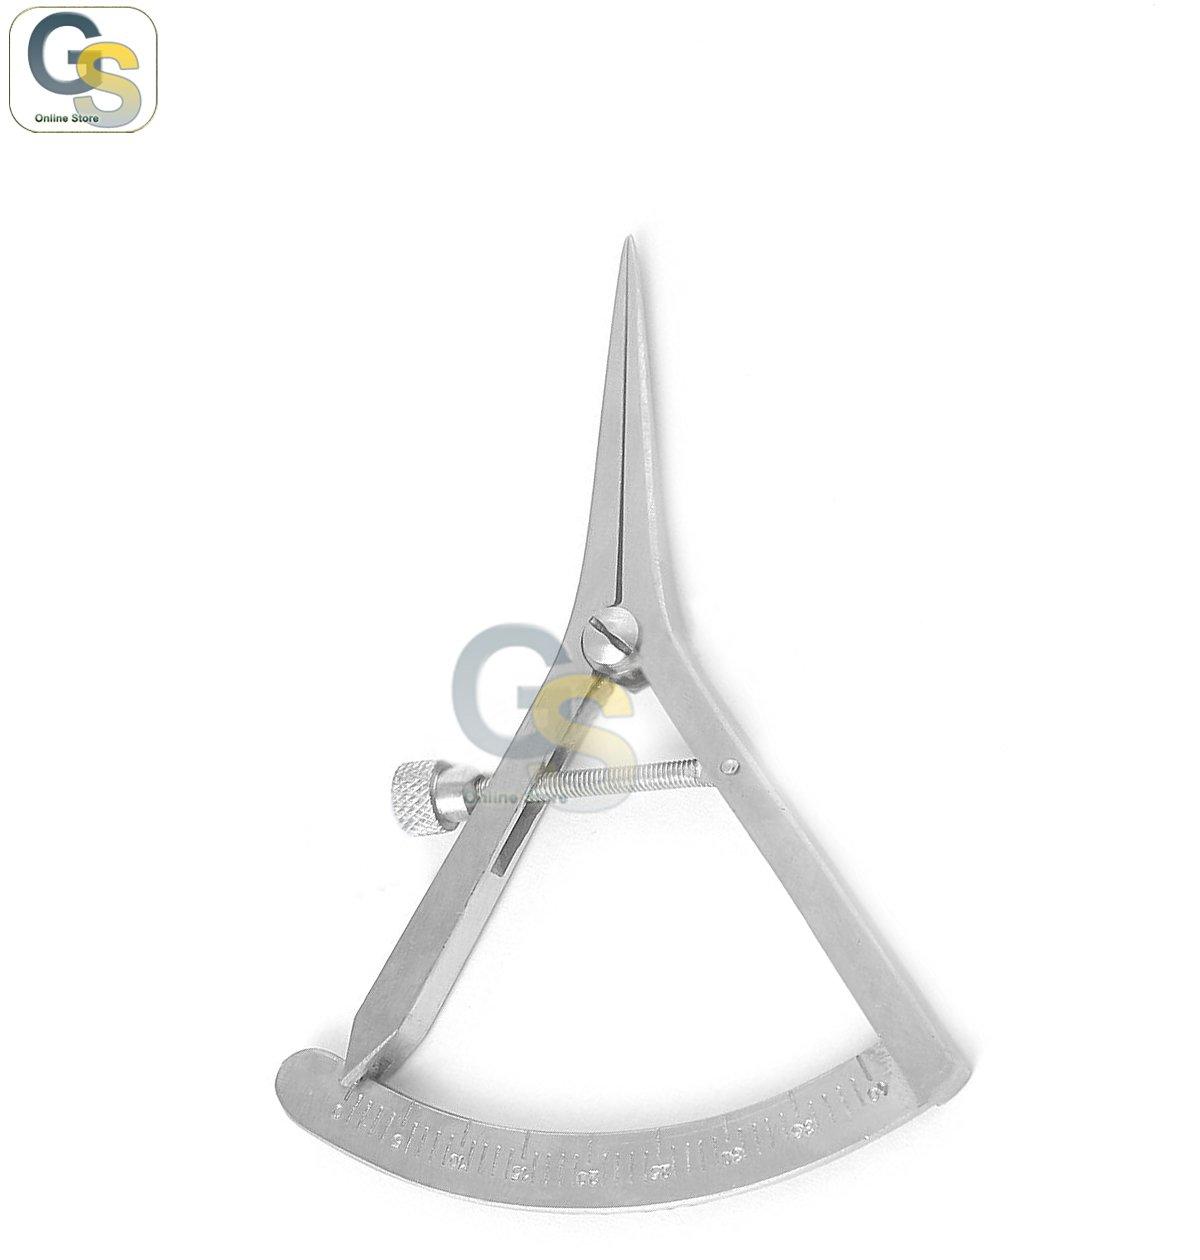 G.S STAINLESS STEEL CASTROVIEJO CALIPER DENTAL GRADUATED 0-40MM